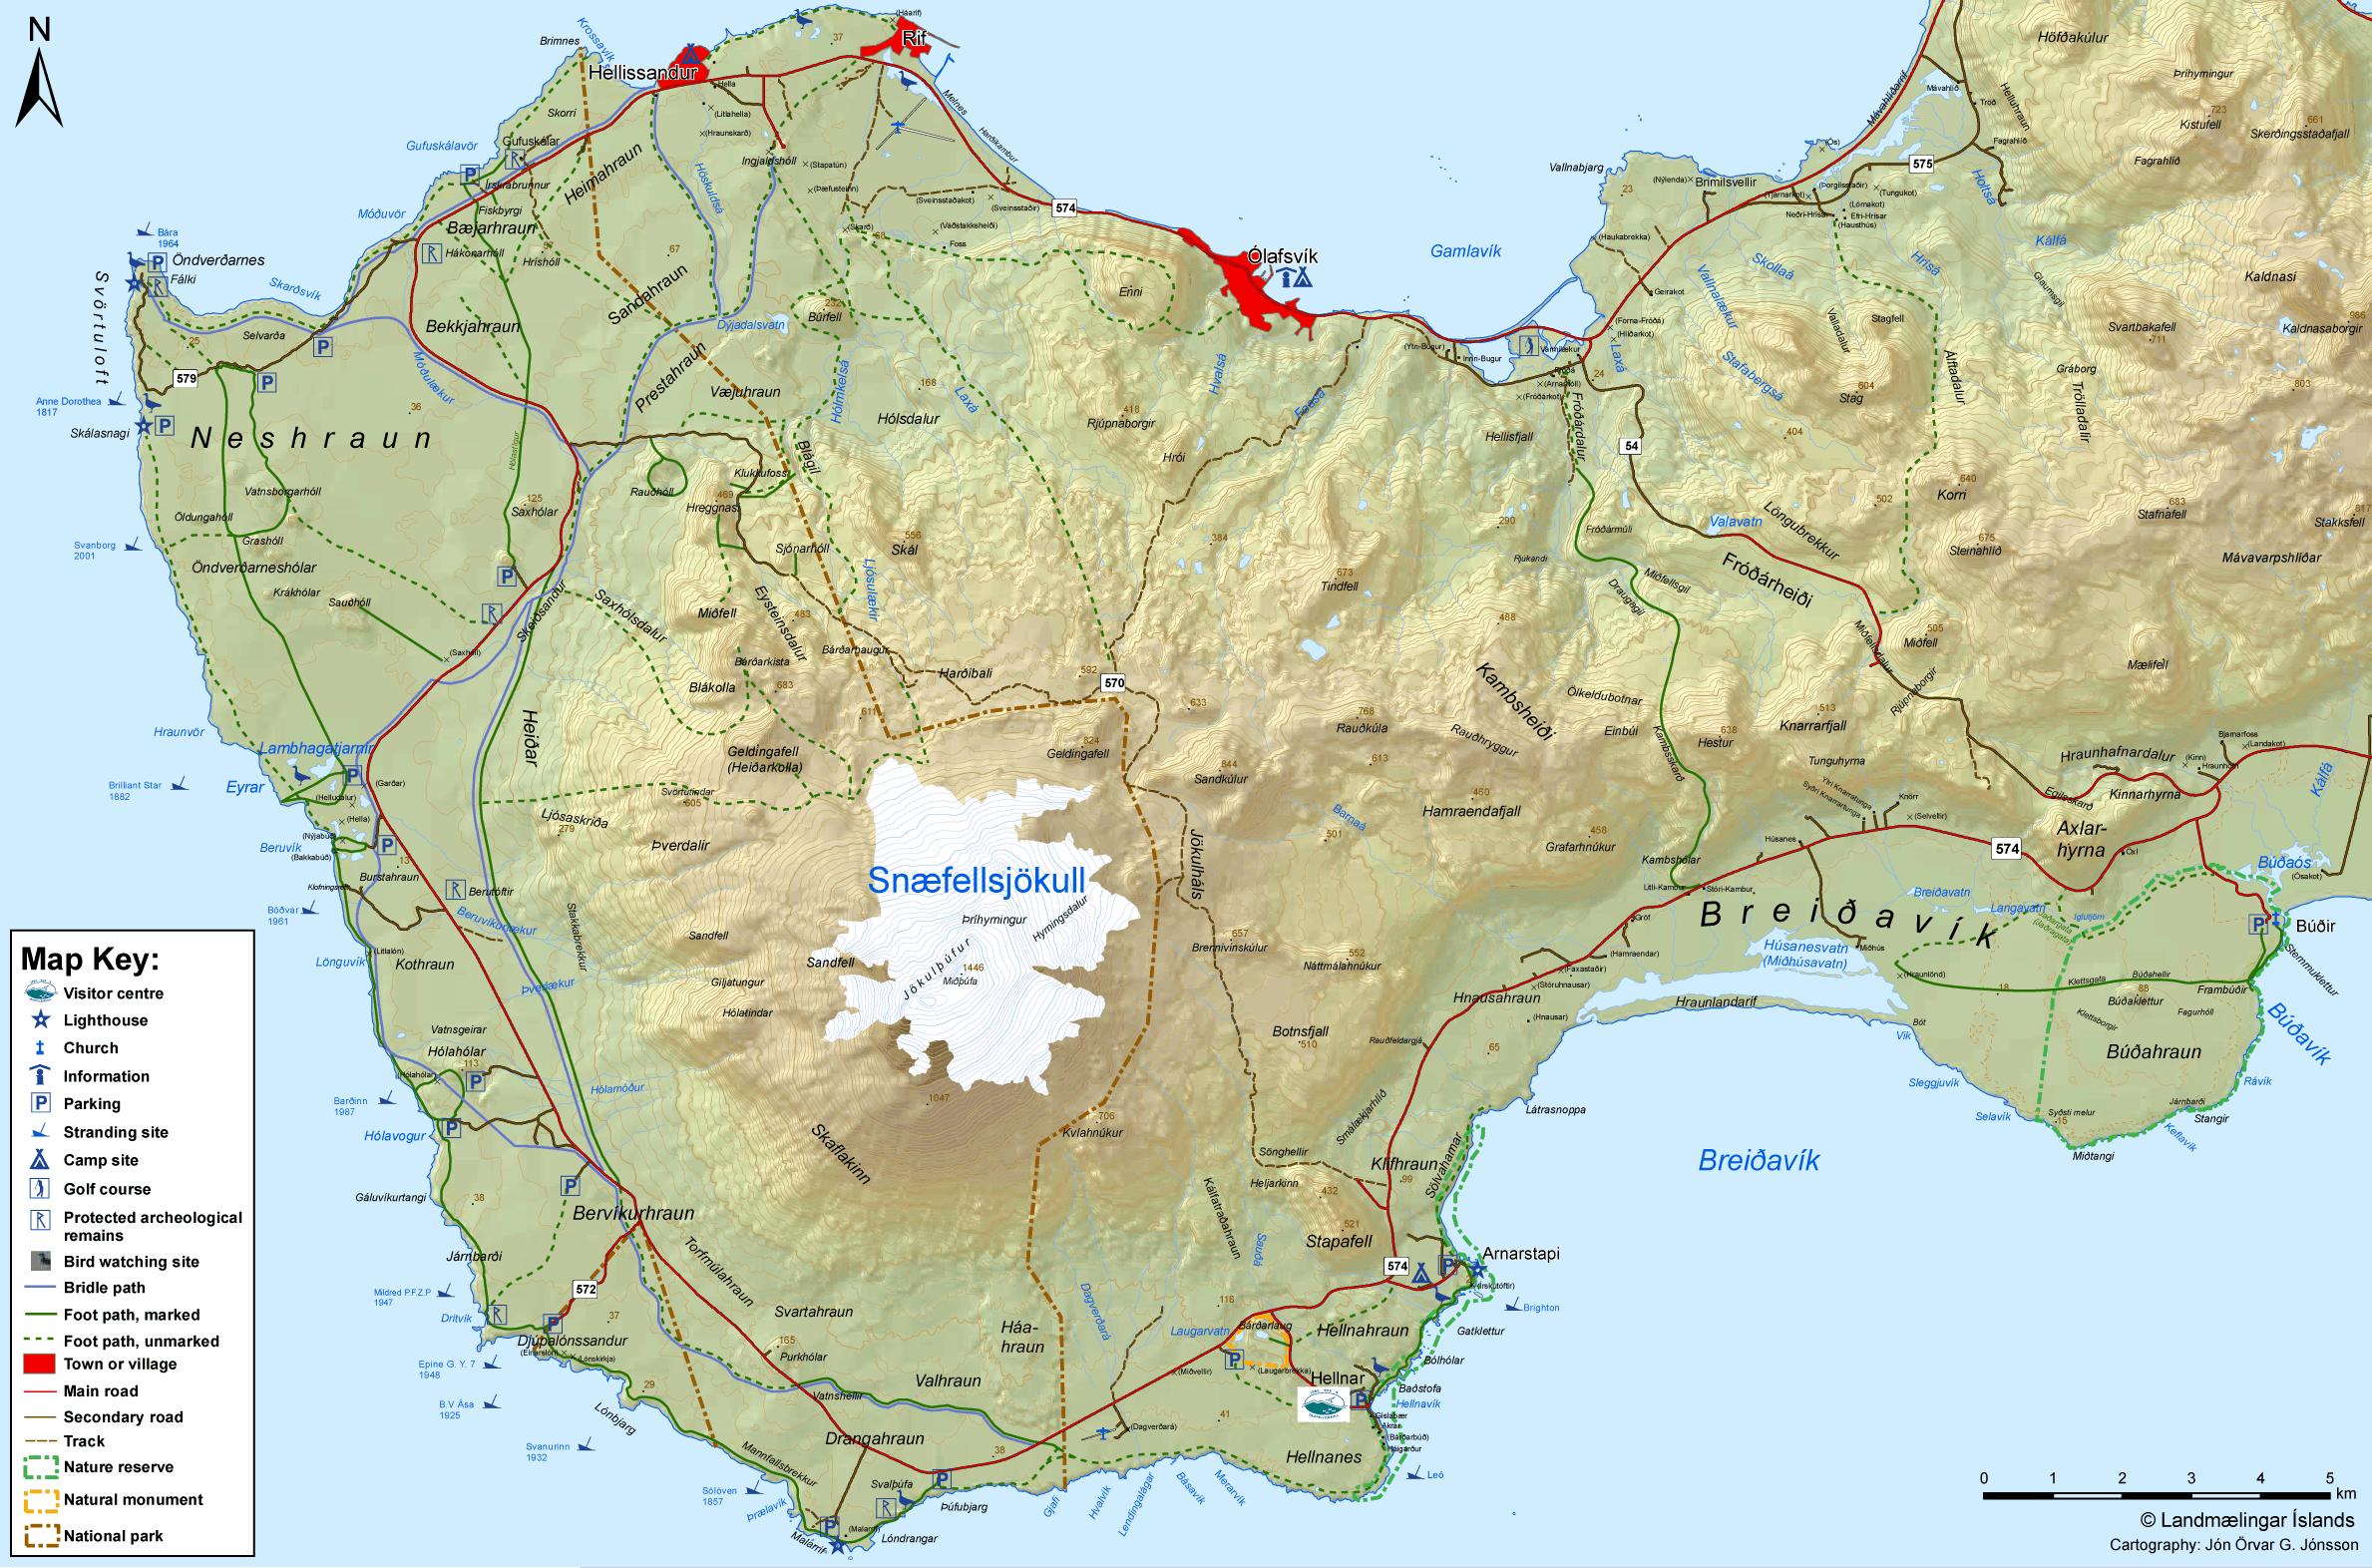 mapa Snafellsjokull península Snaefellsnes Parque nacional peninsula Snæfellsnes Islandia viajar por libre a Islandia blog viajes